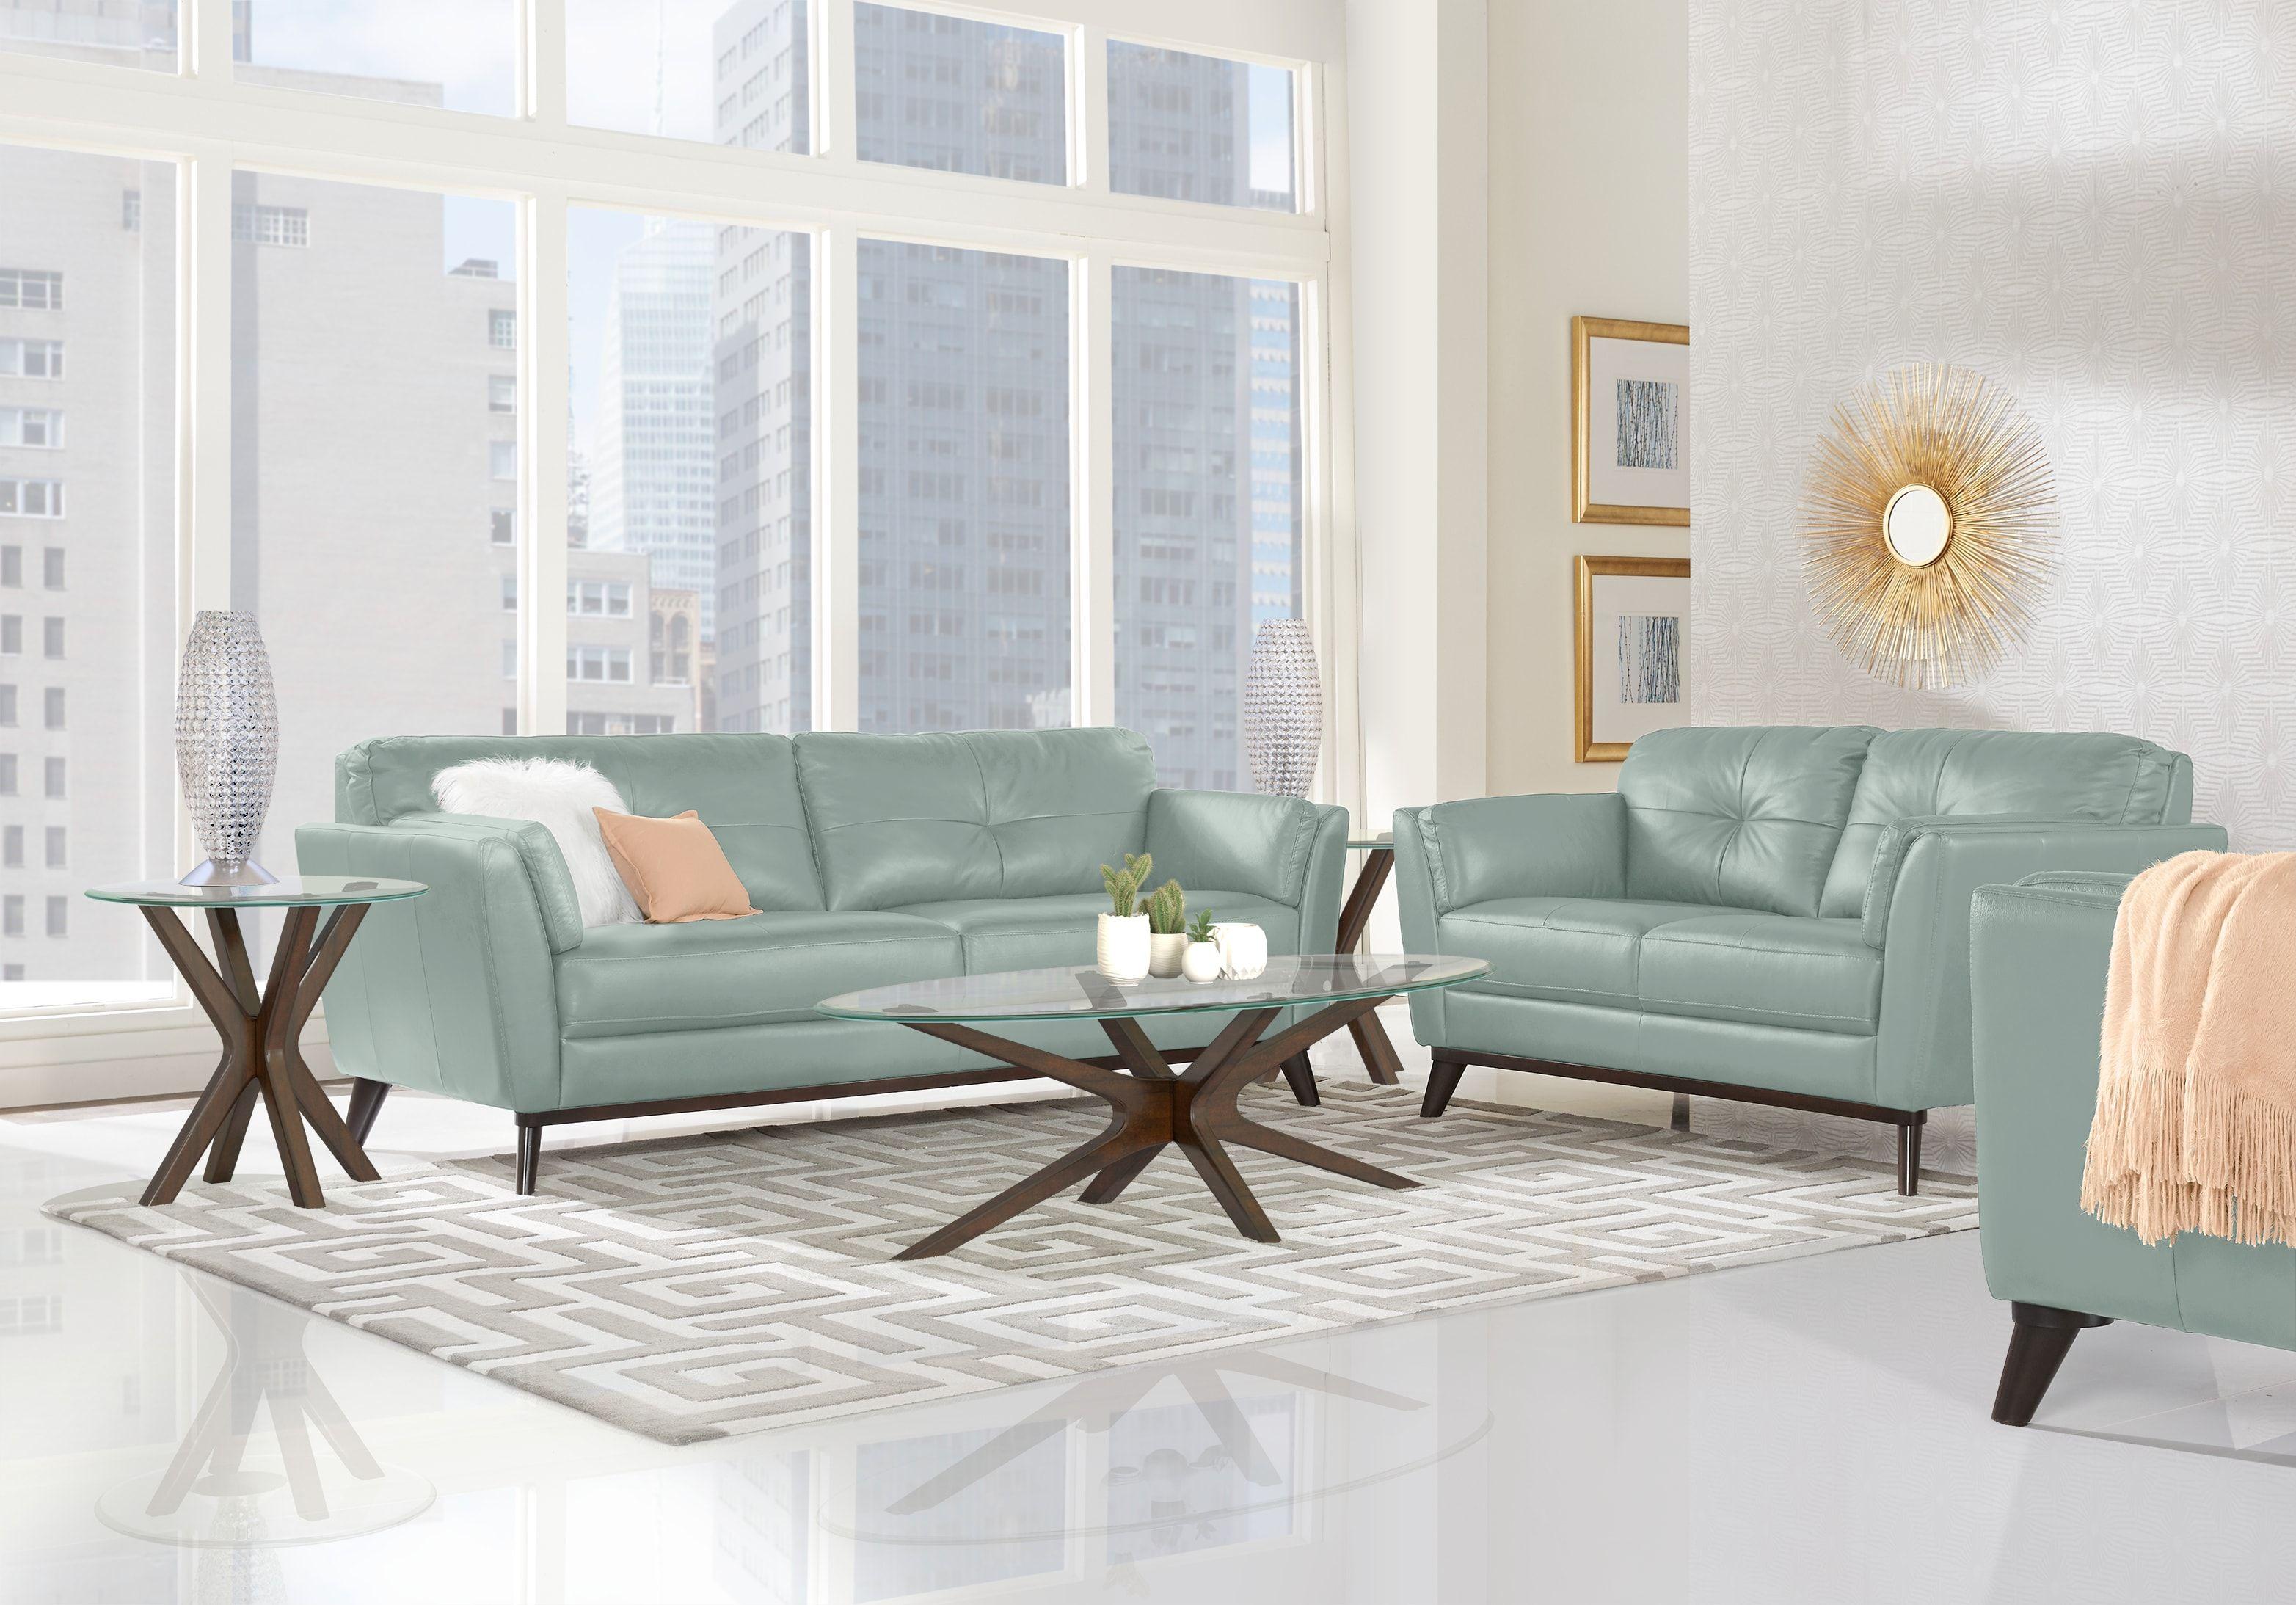 Sofia Vergara Gabriele Spa Blue 5 Pc Leather Living Room 2077 0 5pc Set Includes Loveseat So Living Room Sets Furniture Living Room Leather Blue Living Room